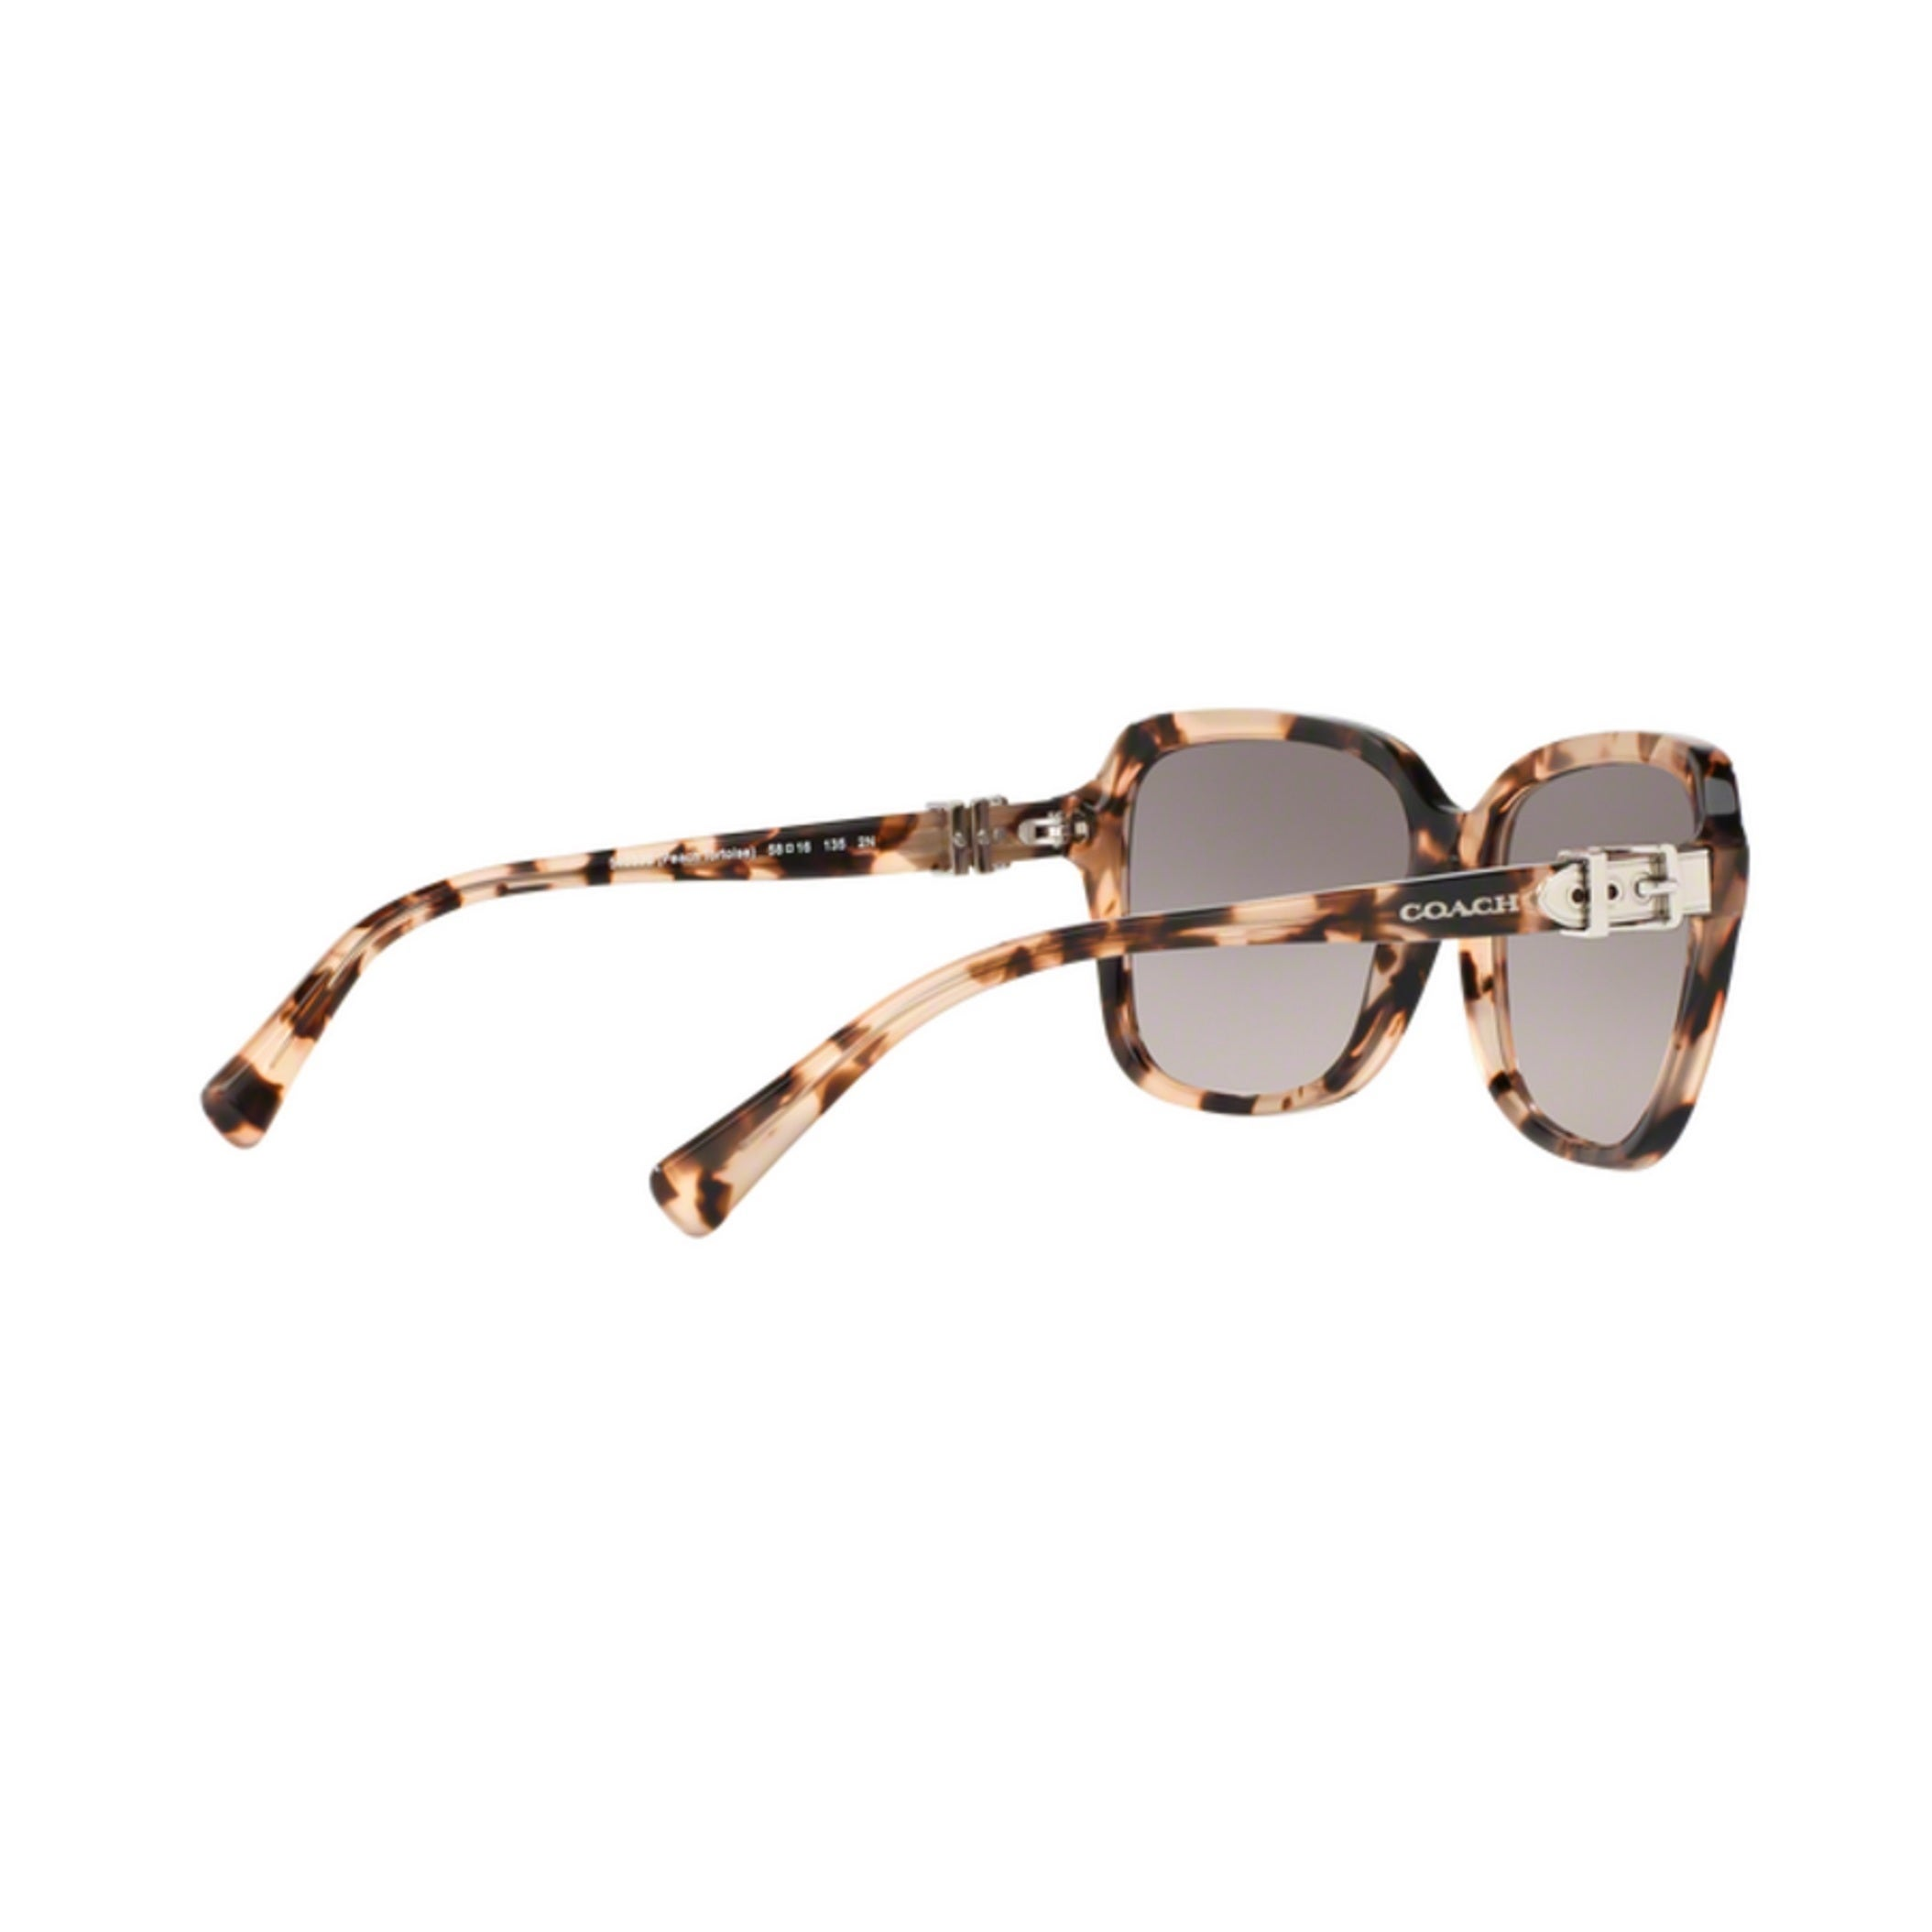 b5ef0b3fbd849 Shop Coach HC8179 L1598 54033B Peach Tortoise Womens Plastic Square  Sunglasses - Free Shipping Today - Overstock - 12646993